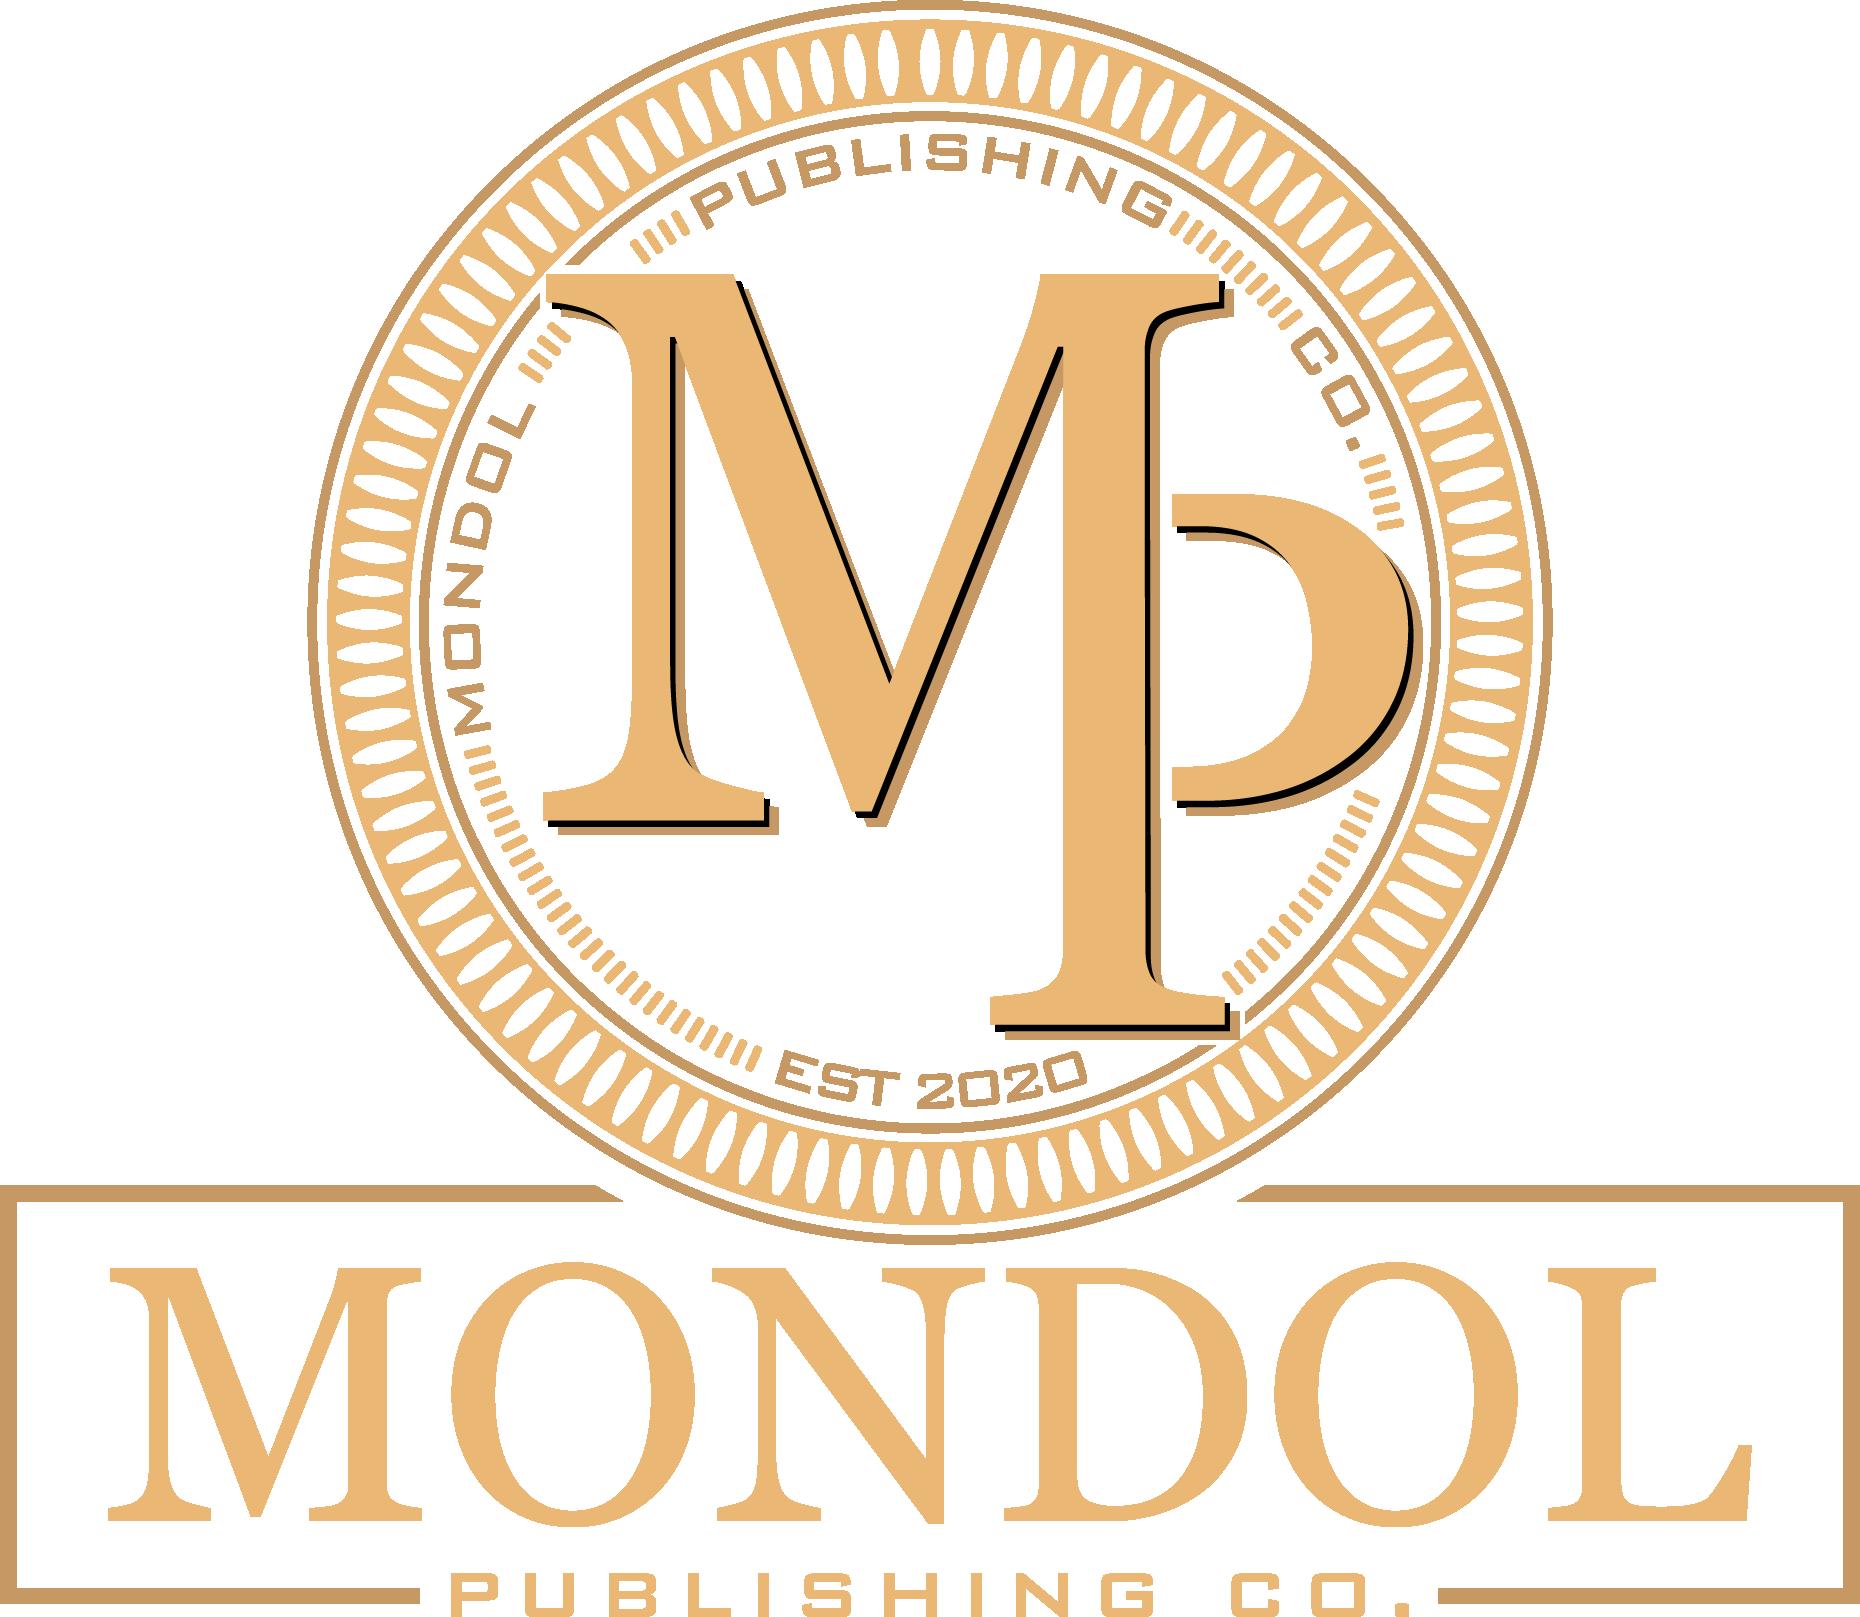 Mondol Publishing Corp